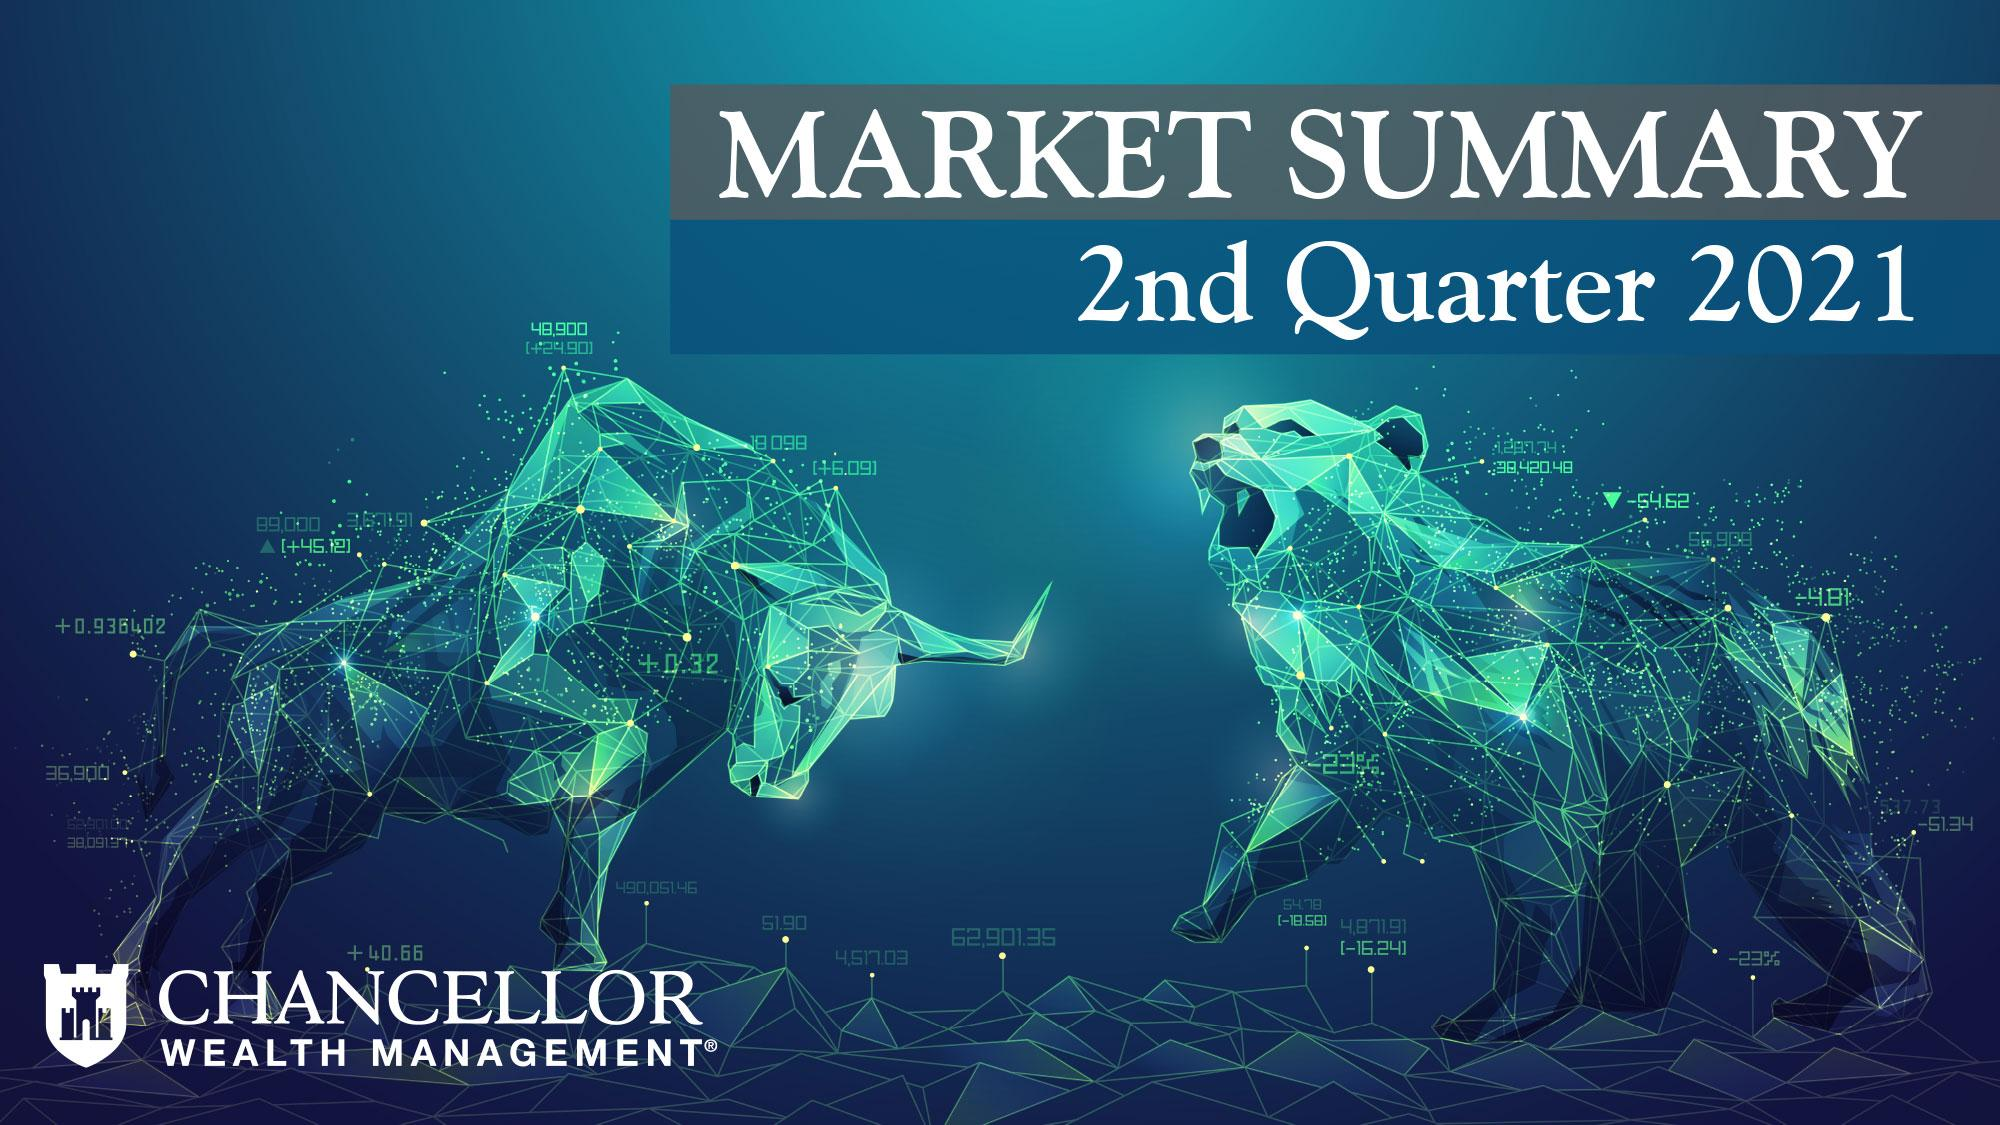 Market Summary 2Q 2021 Thumbnail